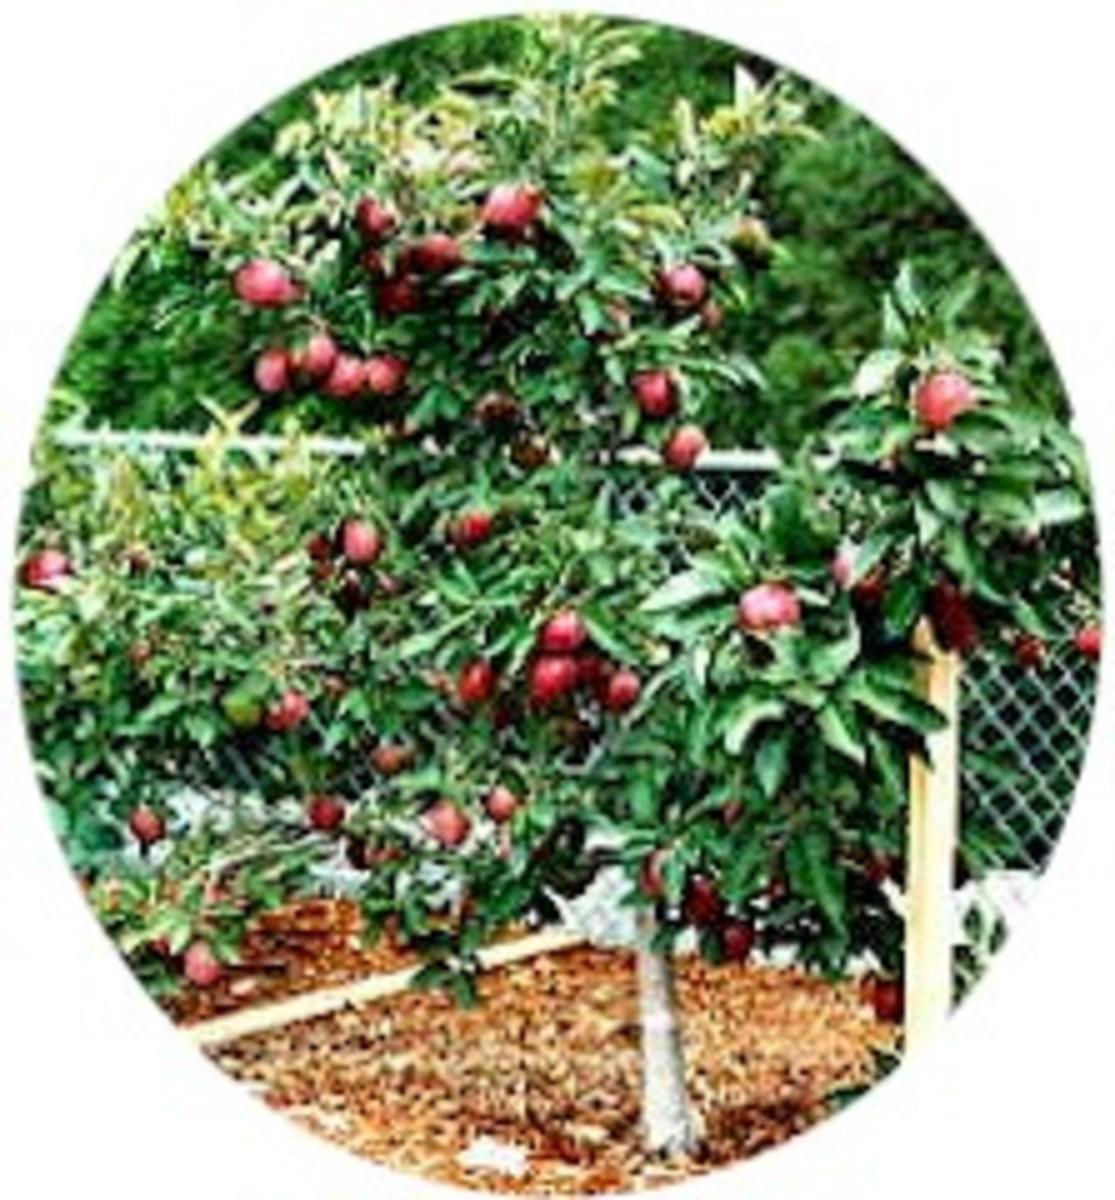 10-tips-on-growing-dwarf-fruit-trees